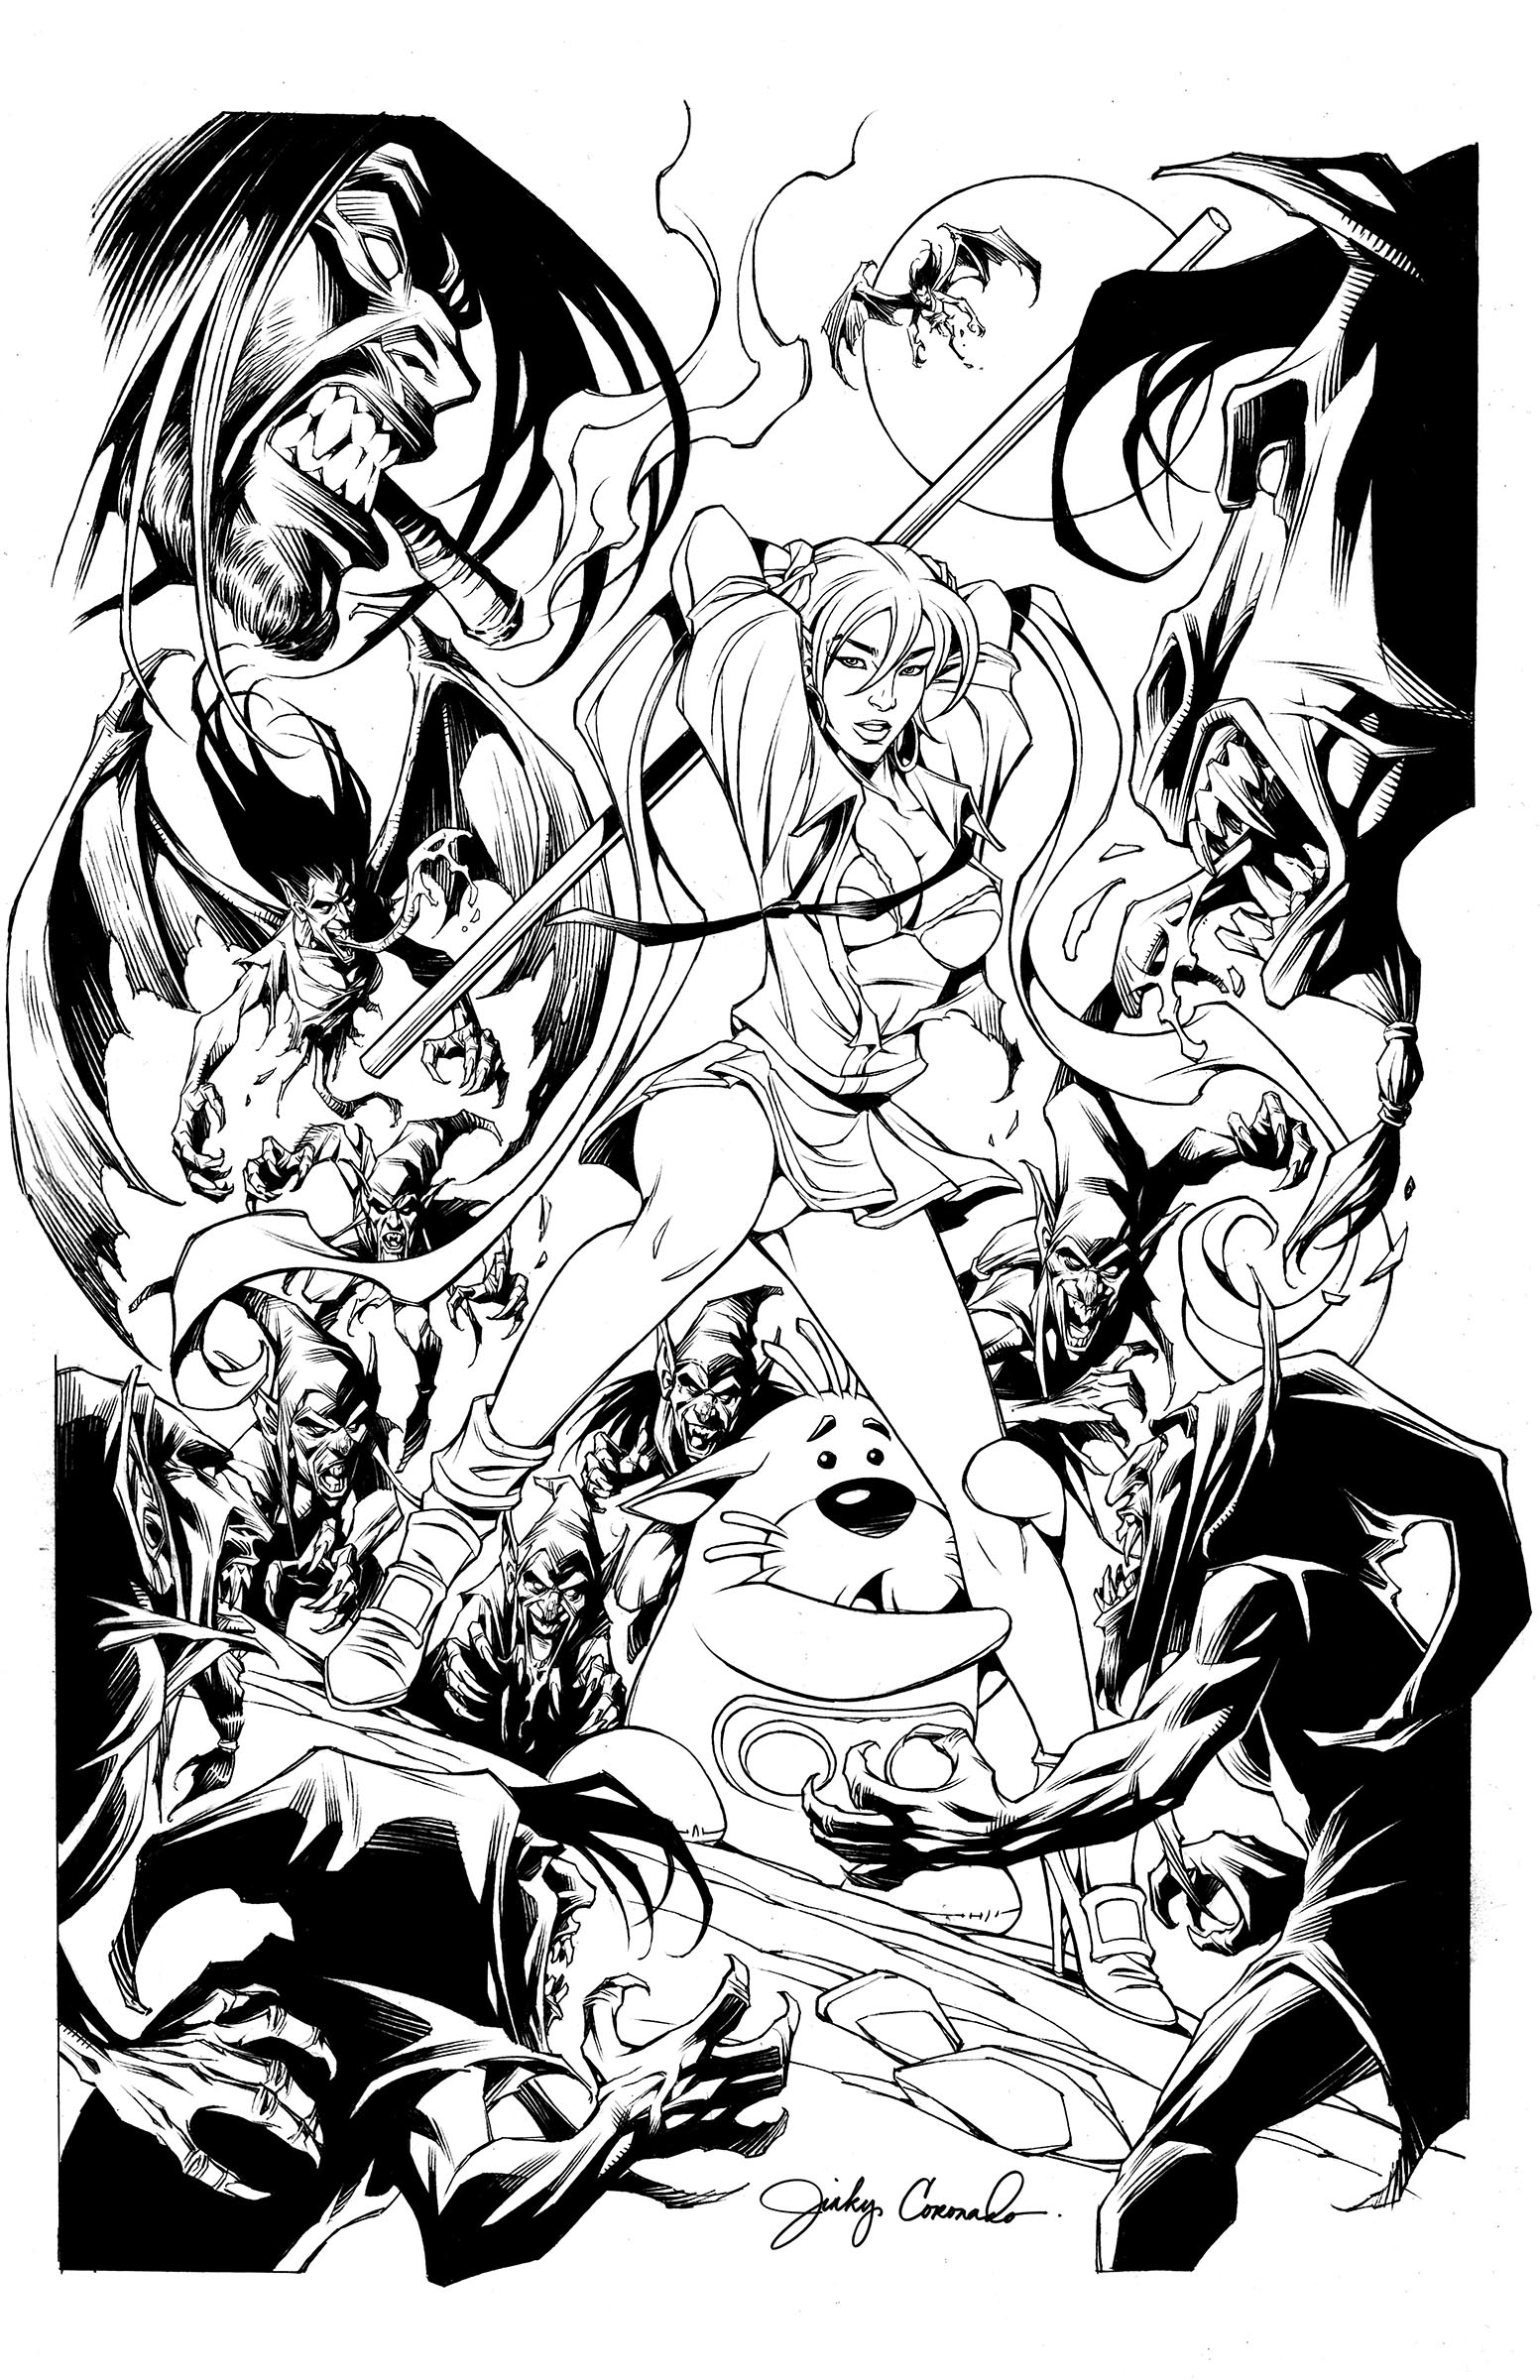 BANZAI GIRL: NIGHT OF THE MYTHMAKERS!  Line art by Jinky Coronado